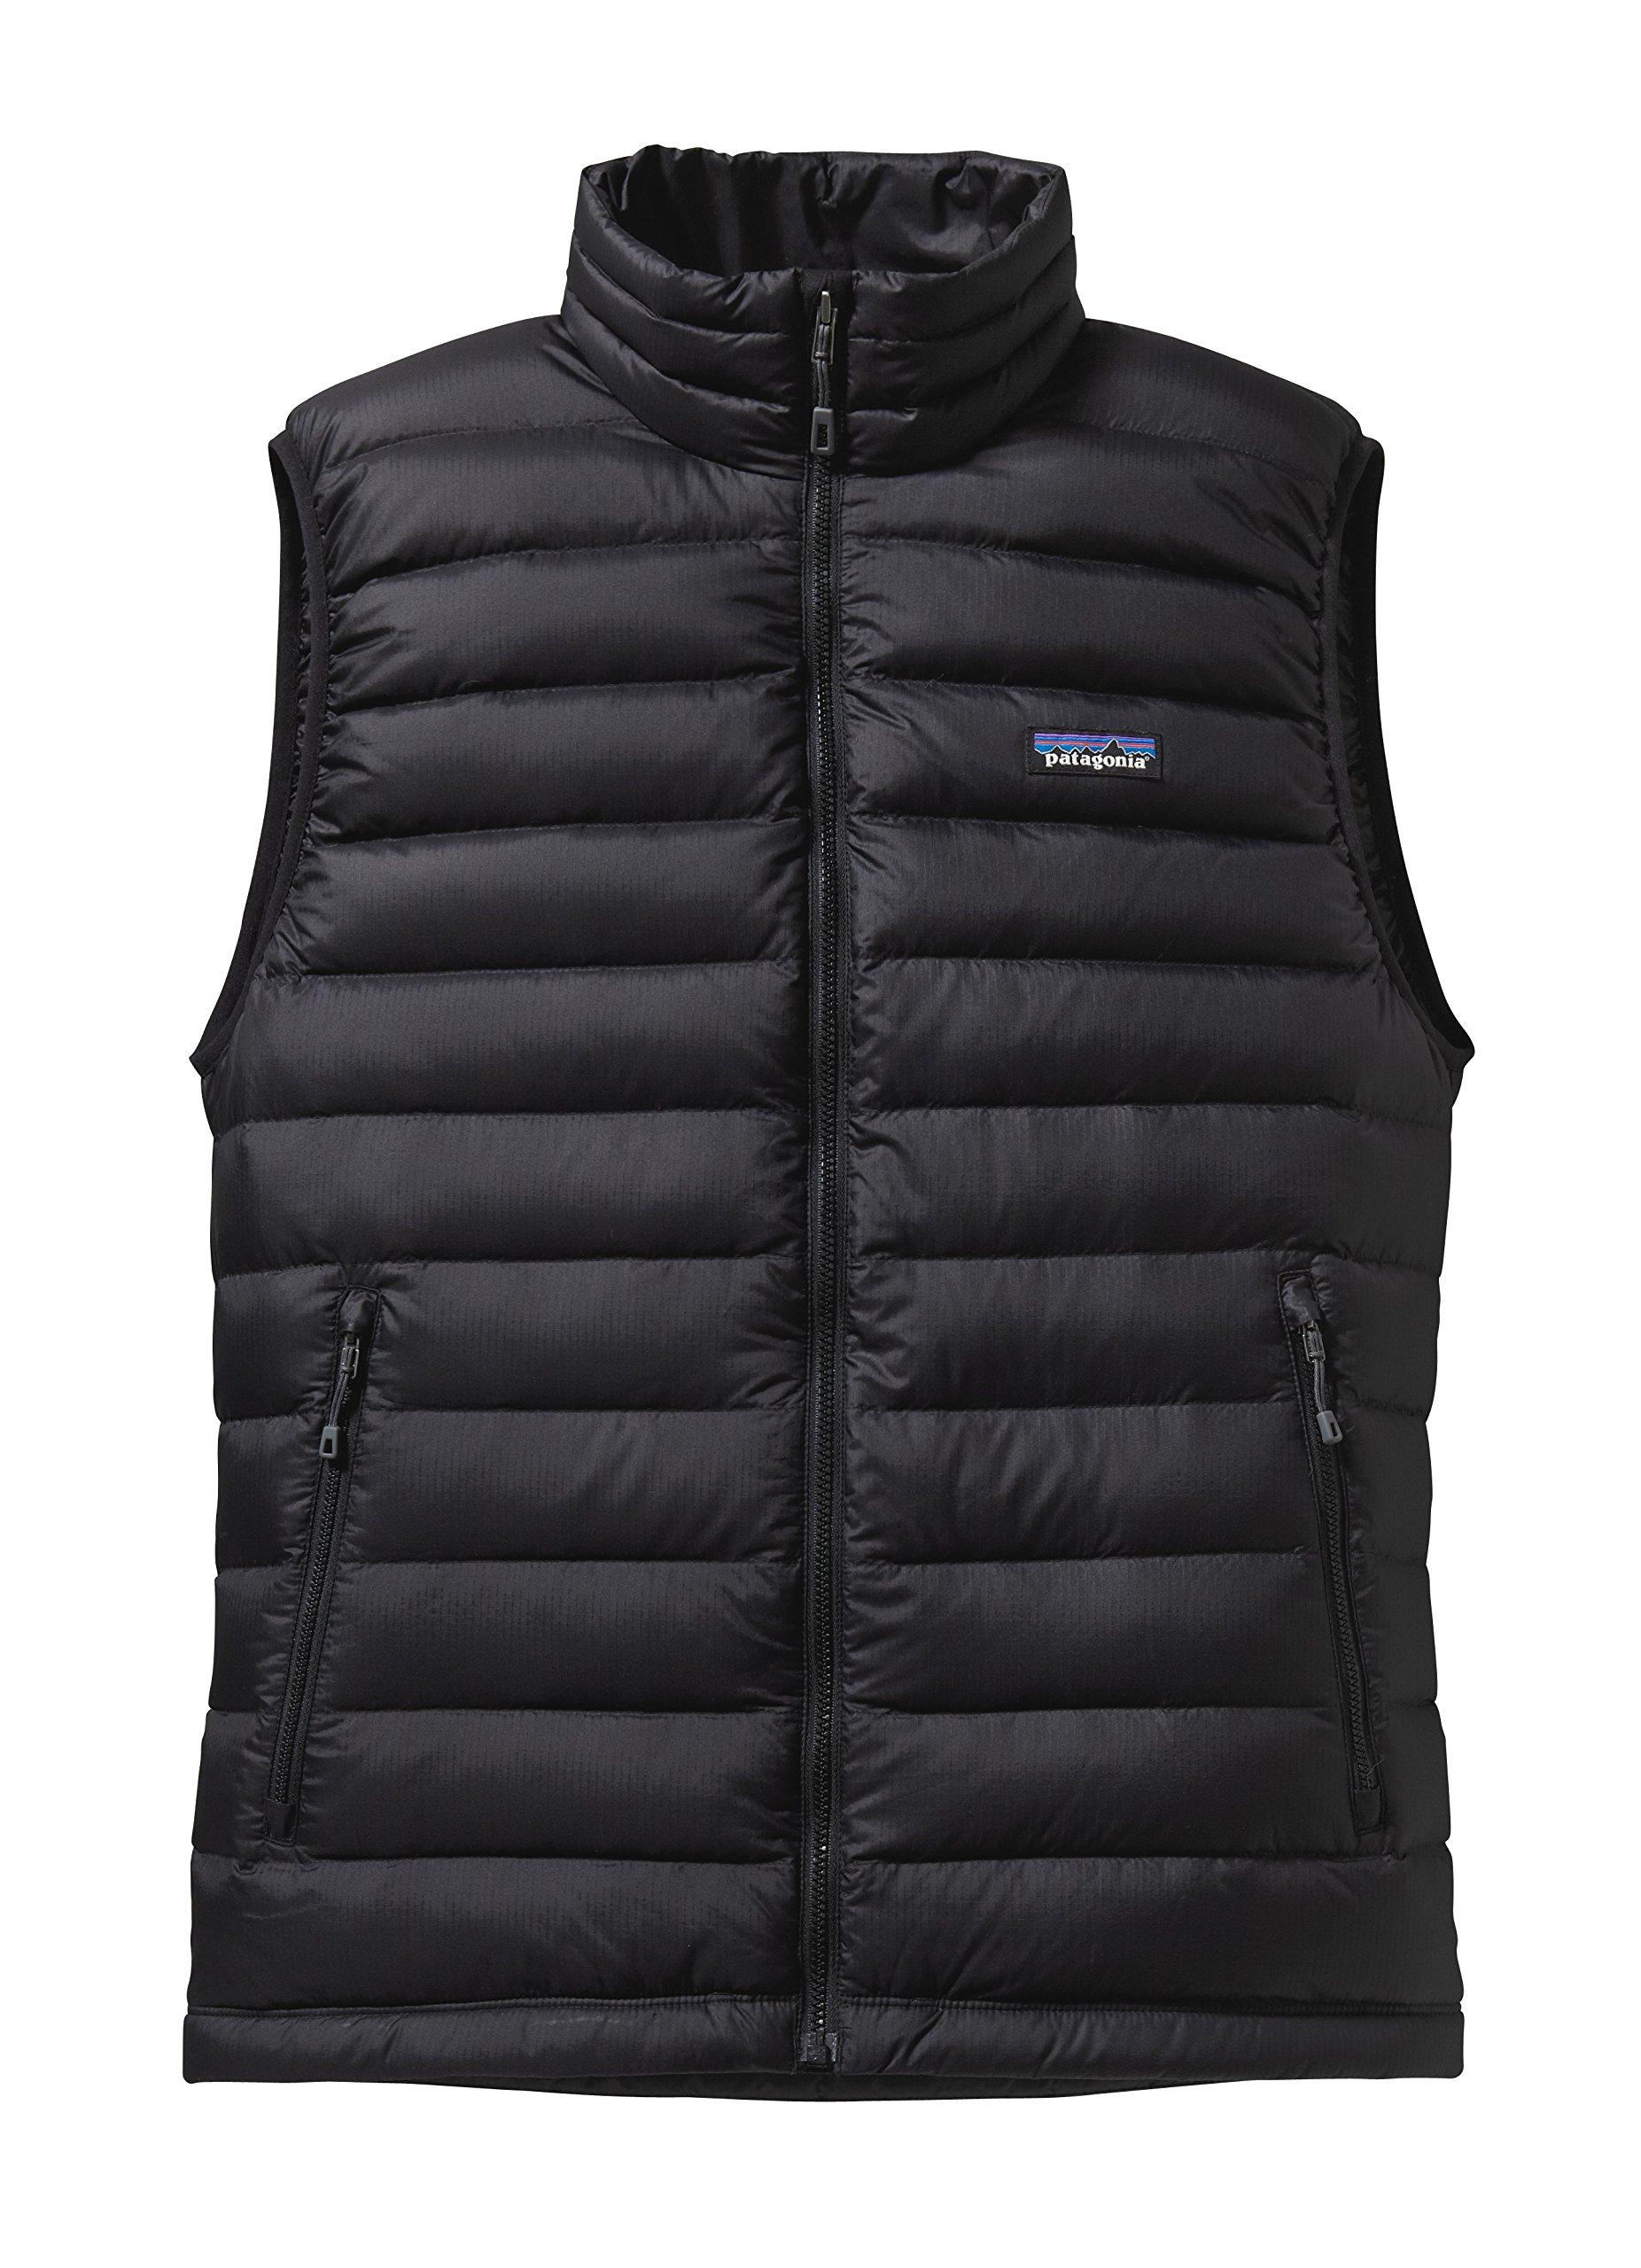 Patagonia Down Sweater Vest Black Mens S